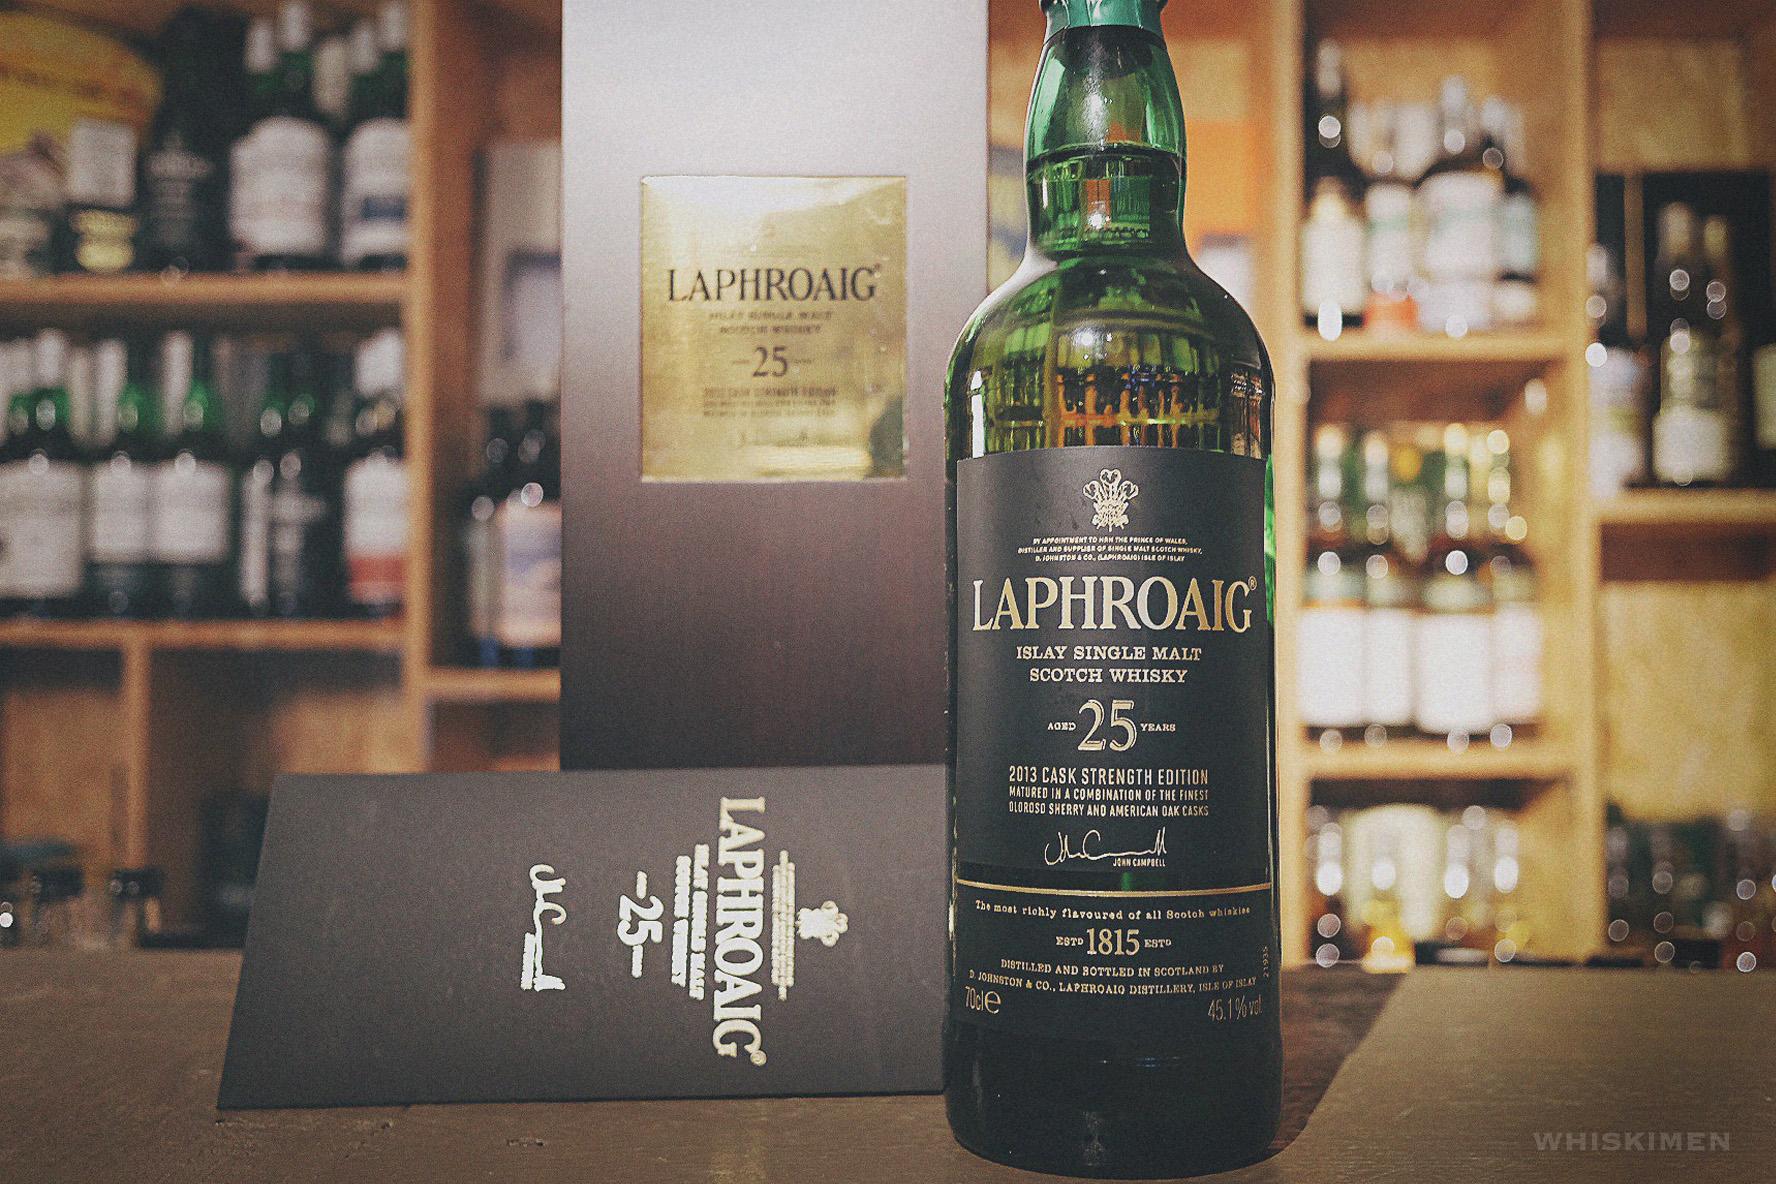 Laphroaig 25 Year Old Single Malt Scotch Whisky (2013 Cask Strength Edition)